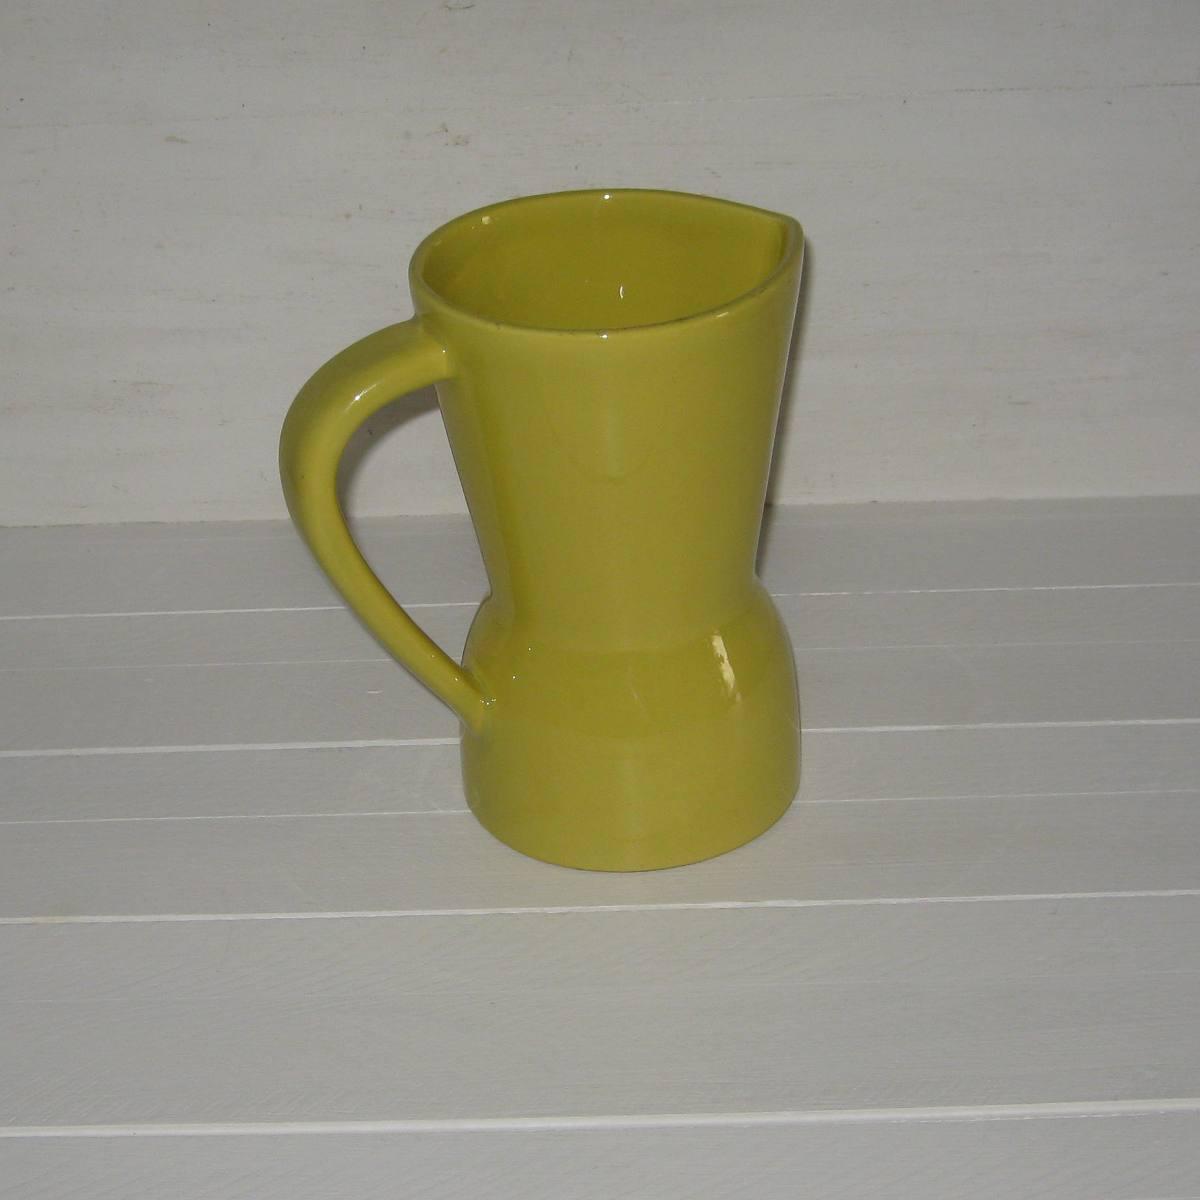 Cruche jaune pichet saint clement 1